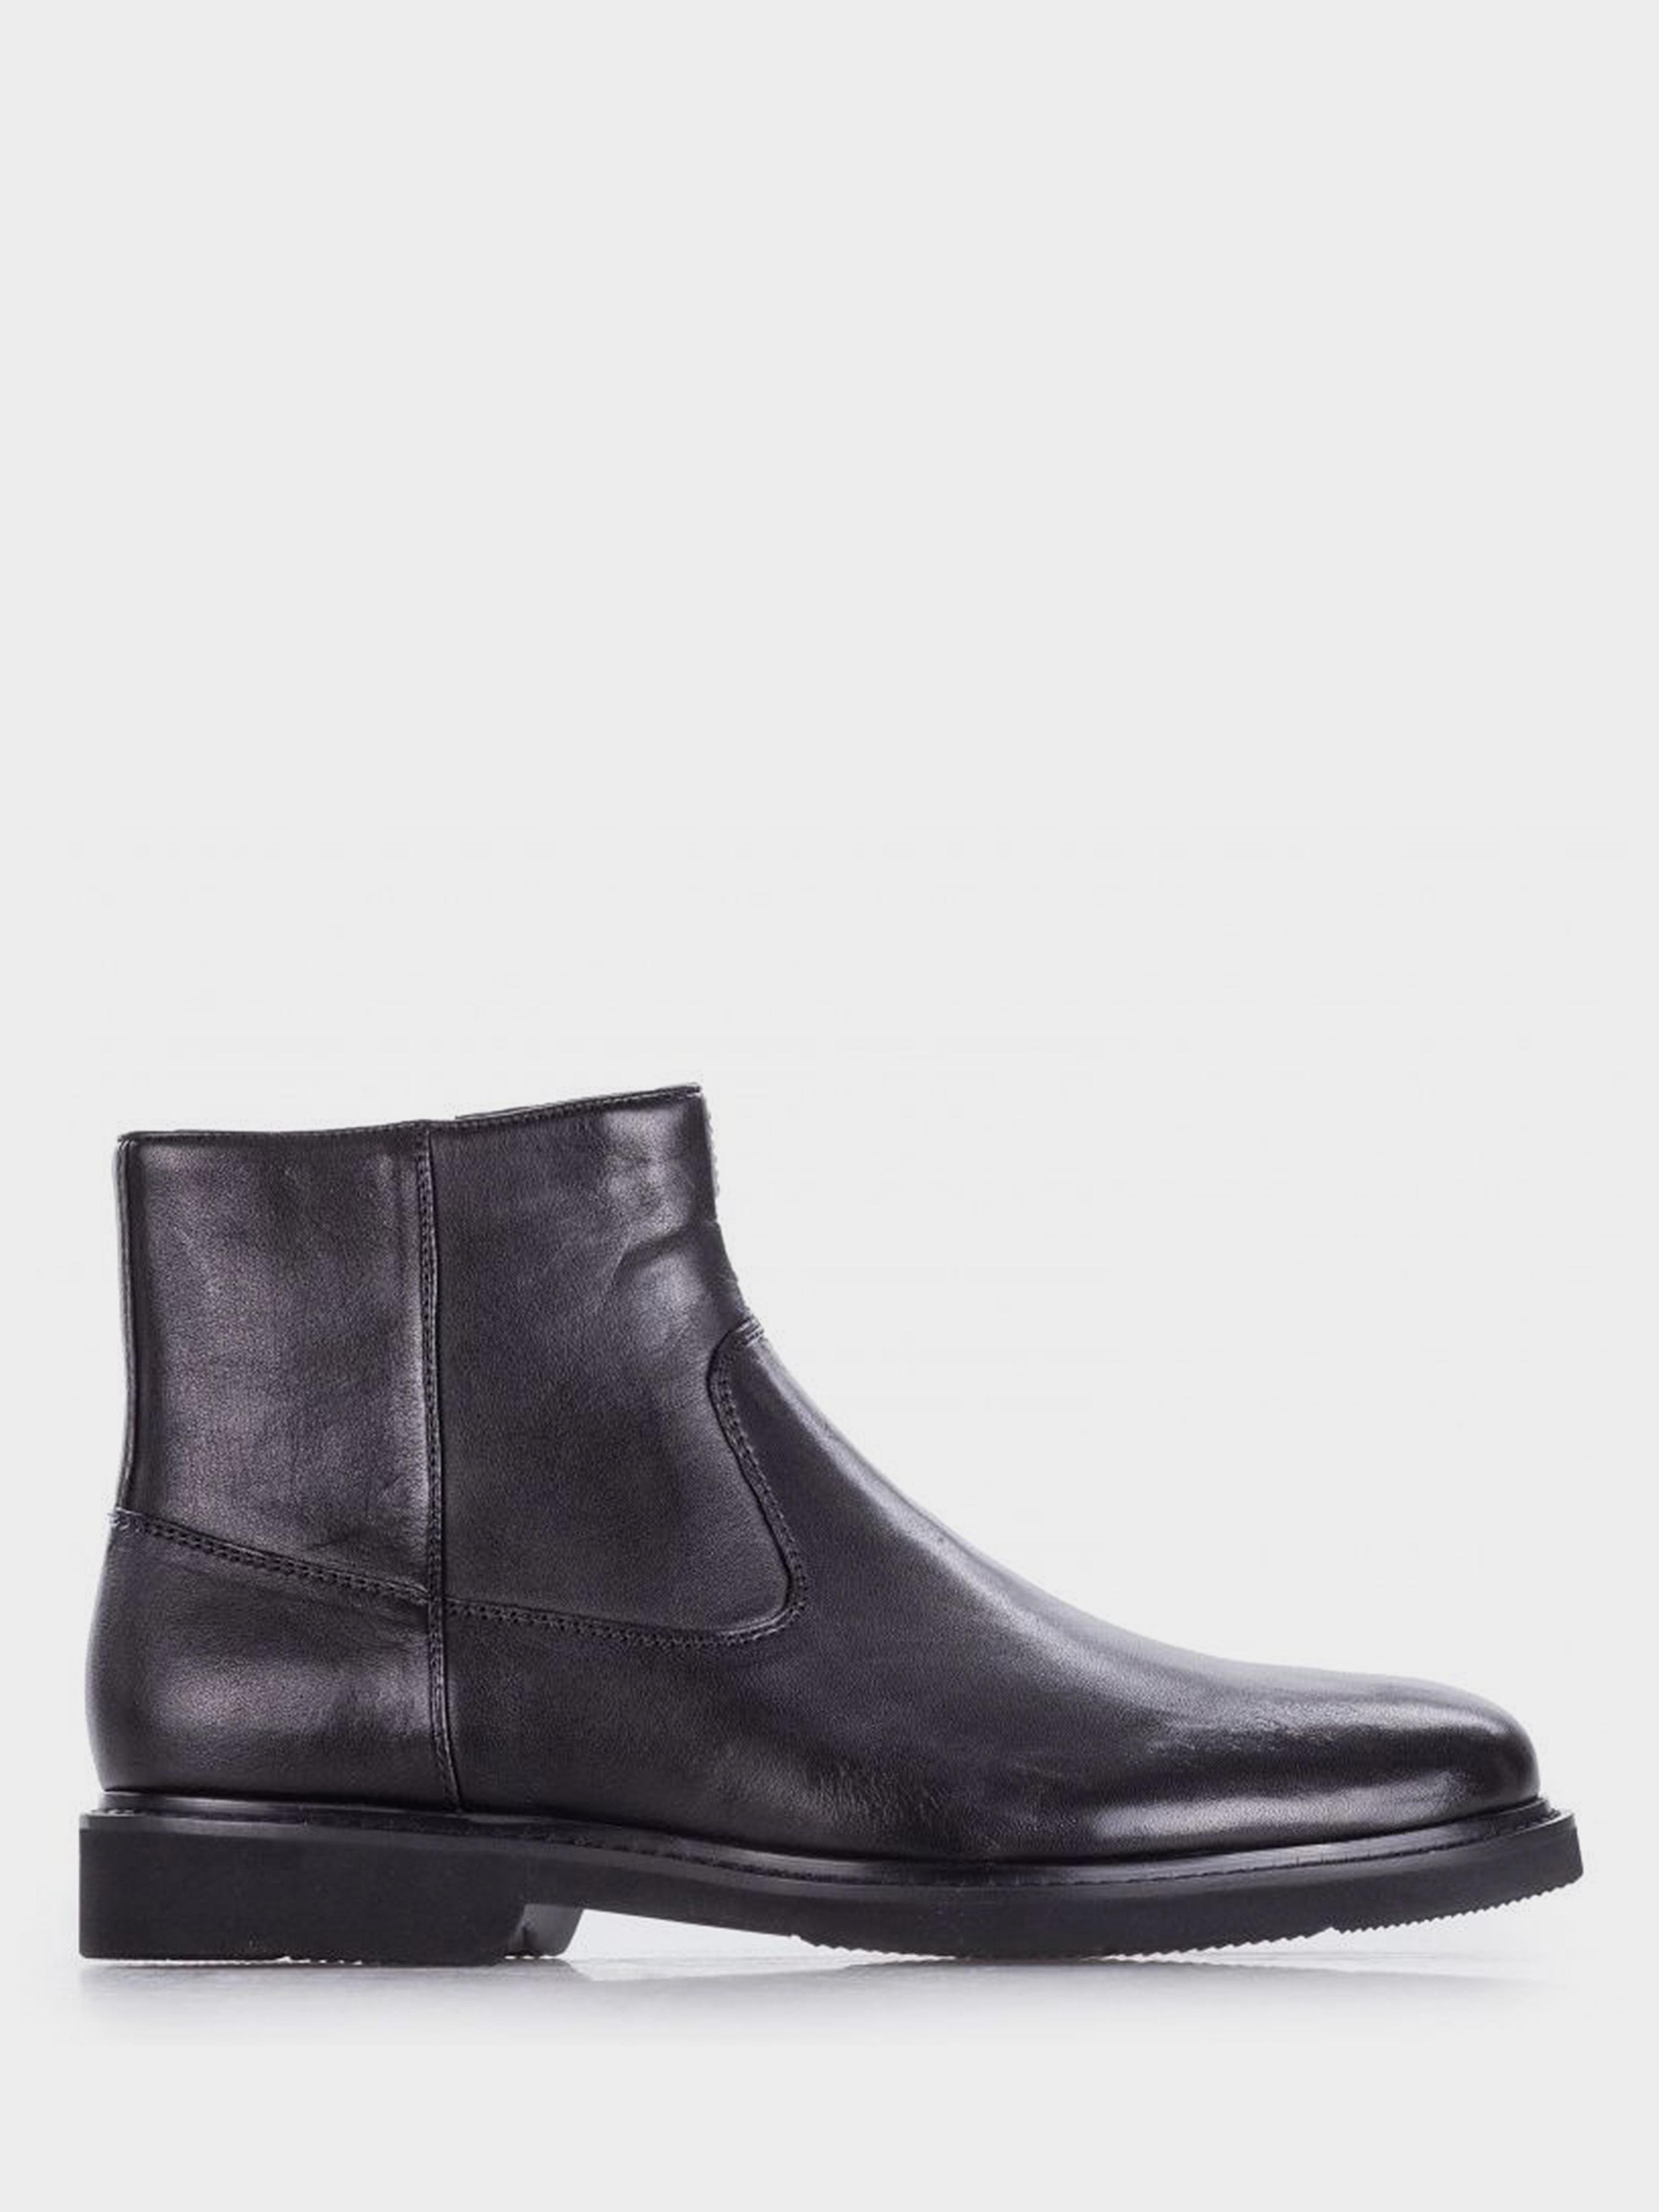 Ботинки для мужчин Braska BR1551 брендовые, 2017